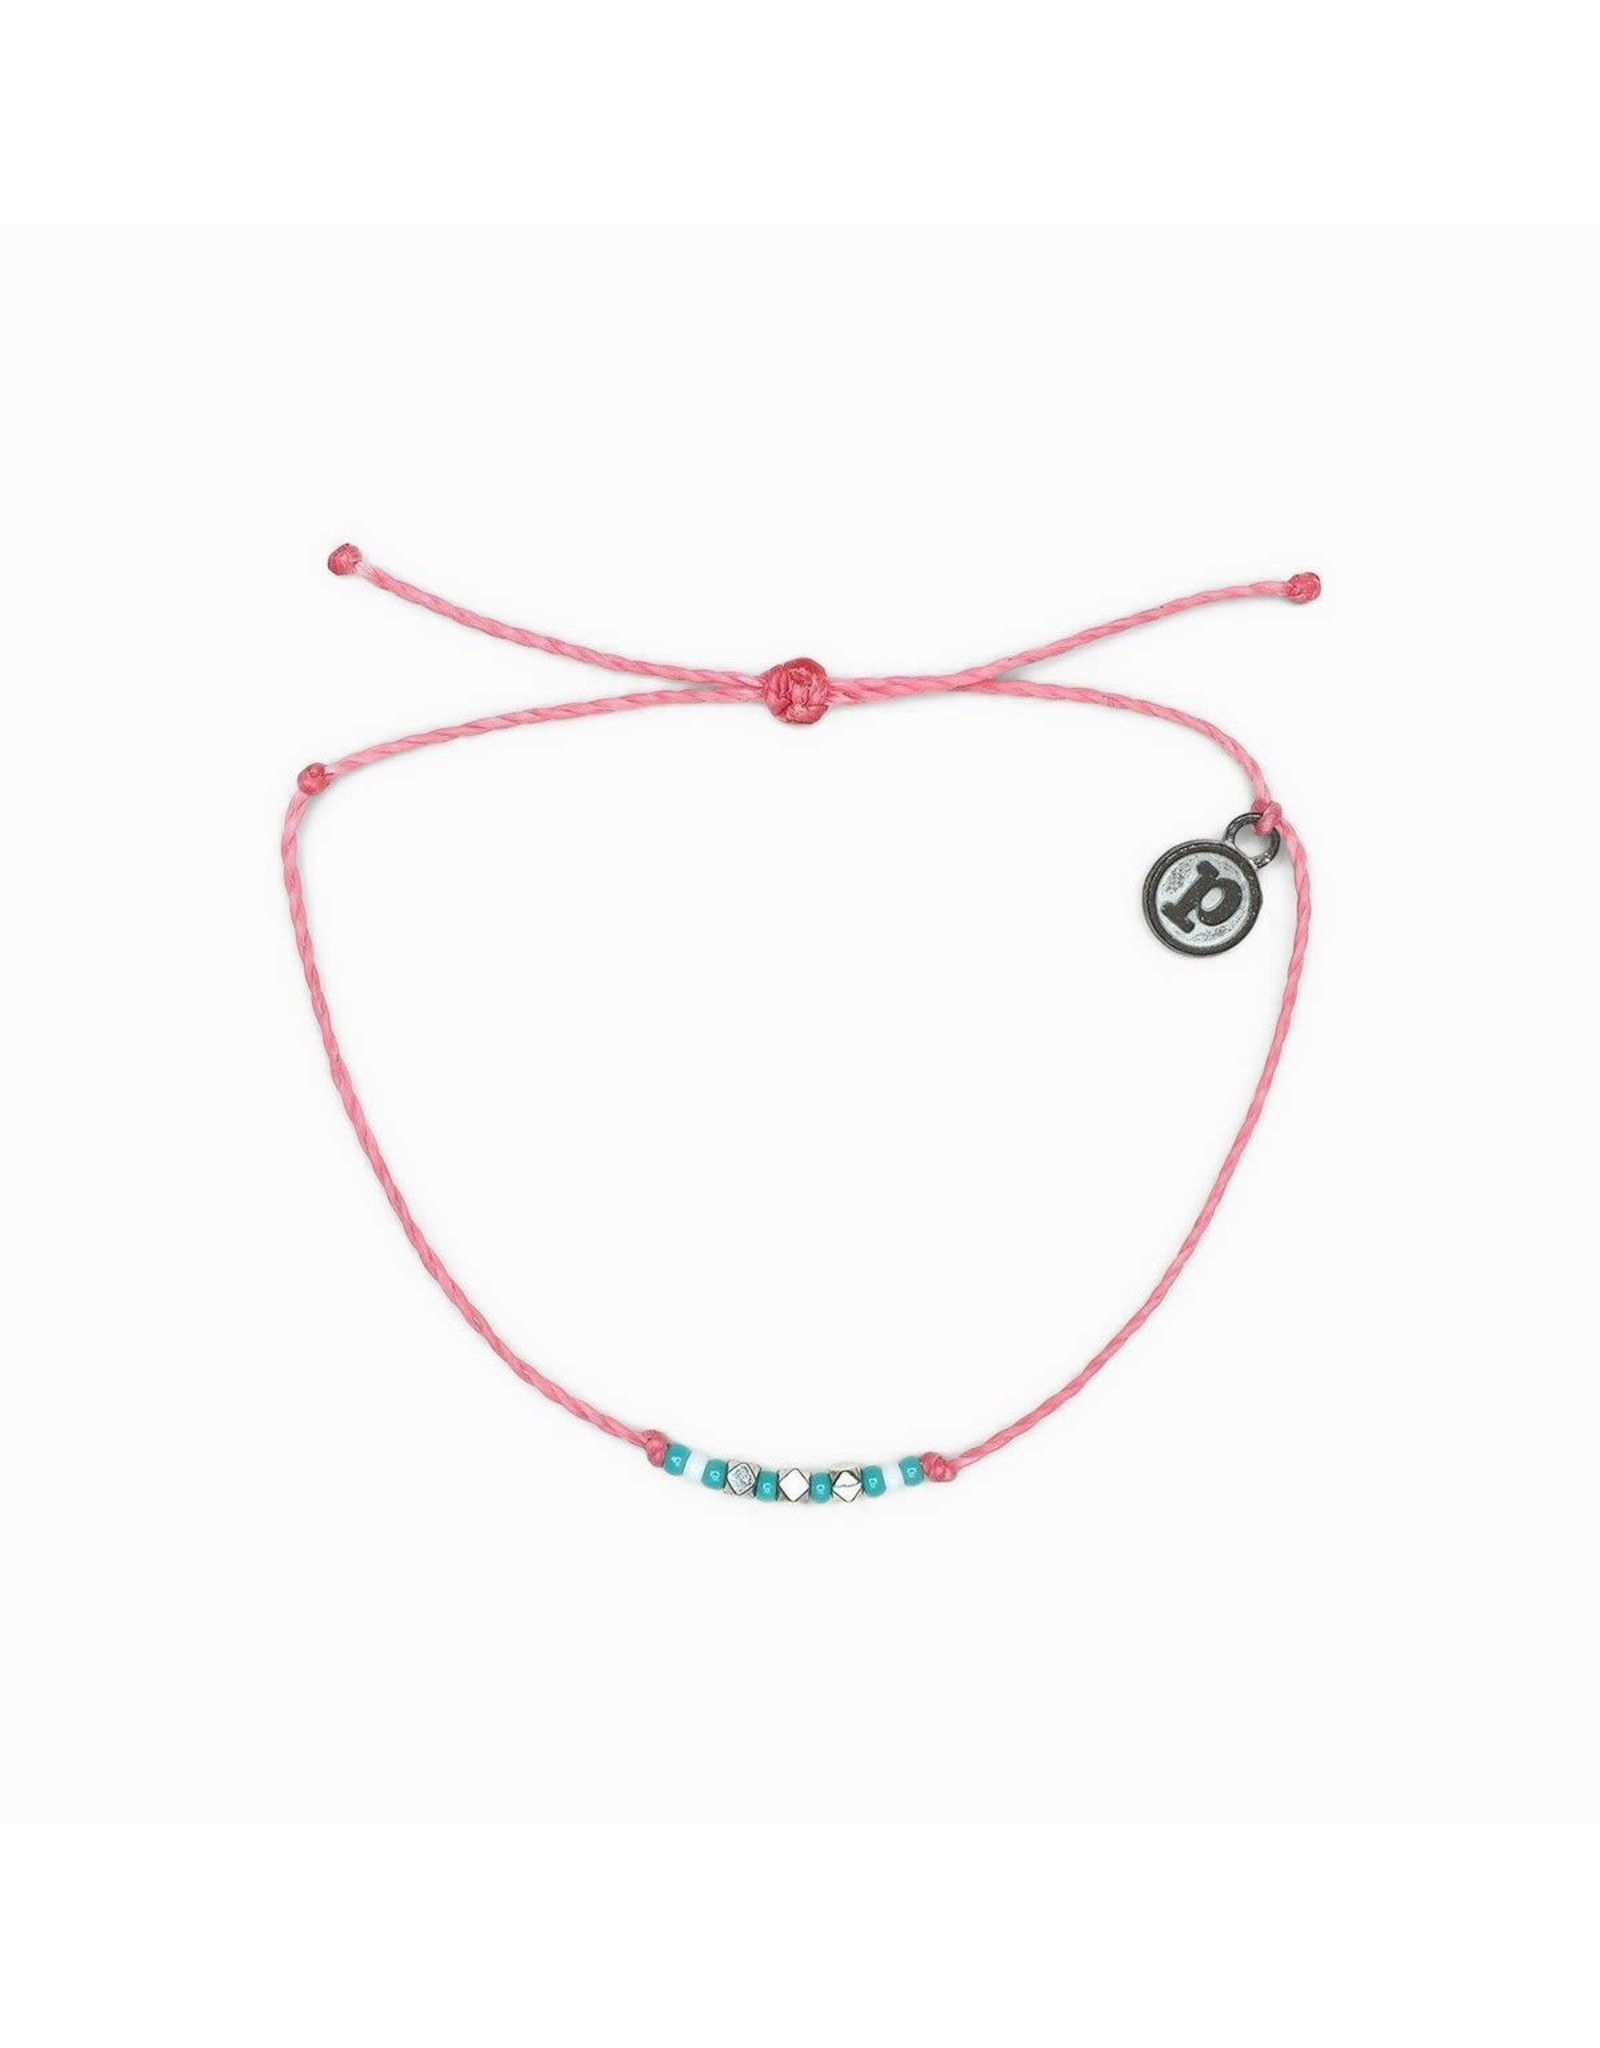 SILVER Delicate SEED BEAD Bracelet, PINK